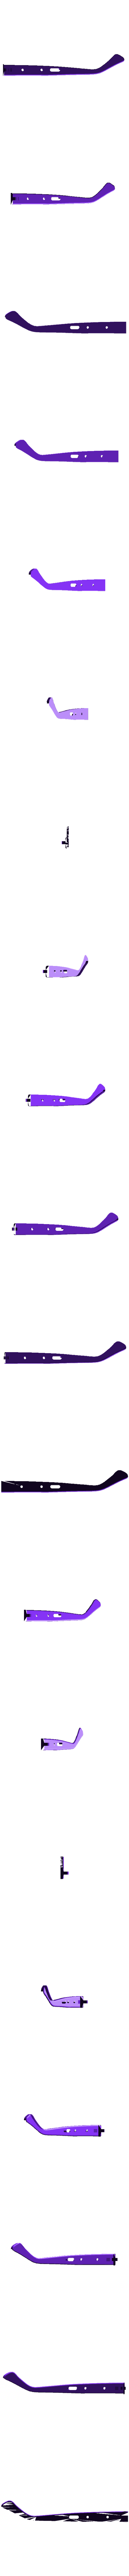 rezz-arm-bat.stl Download free STL file Rezz-Inspired NeoPixel Glasses • 3D printing template, Adafruit